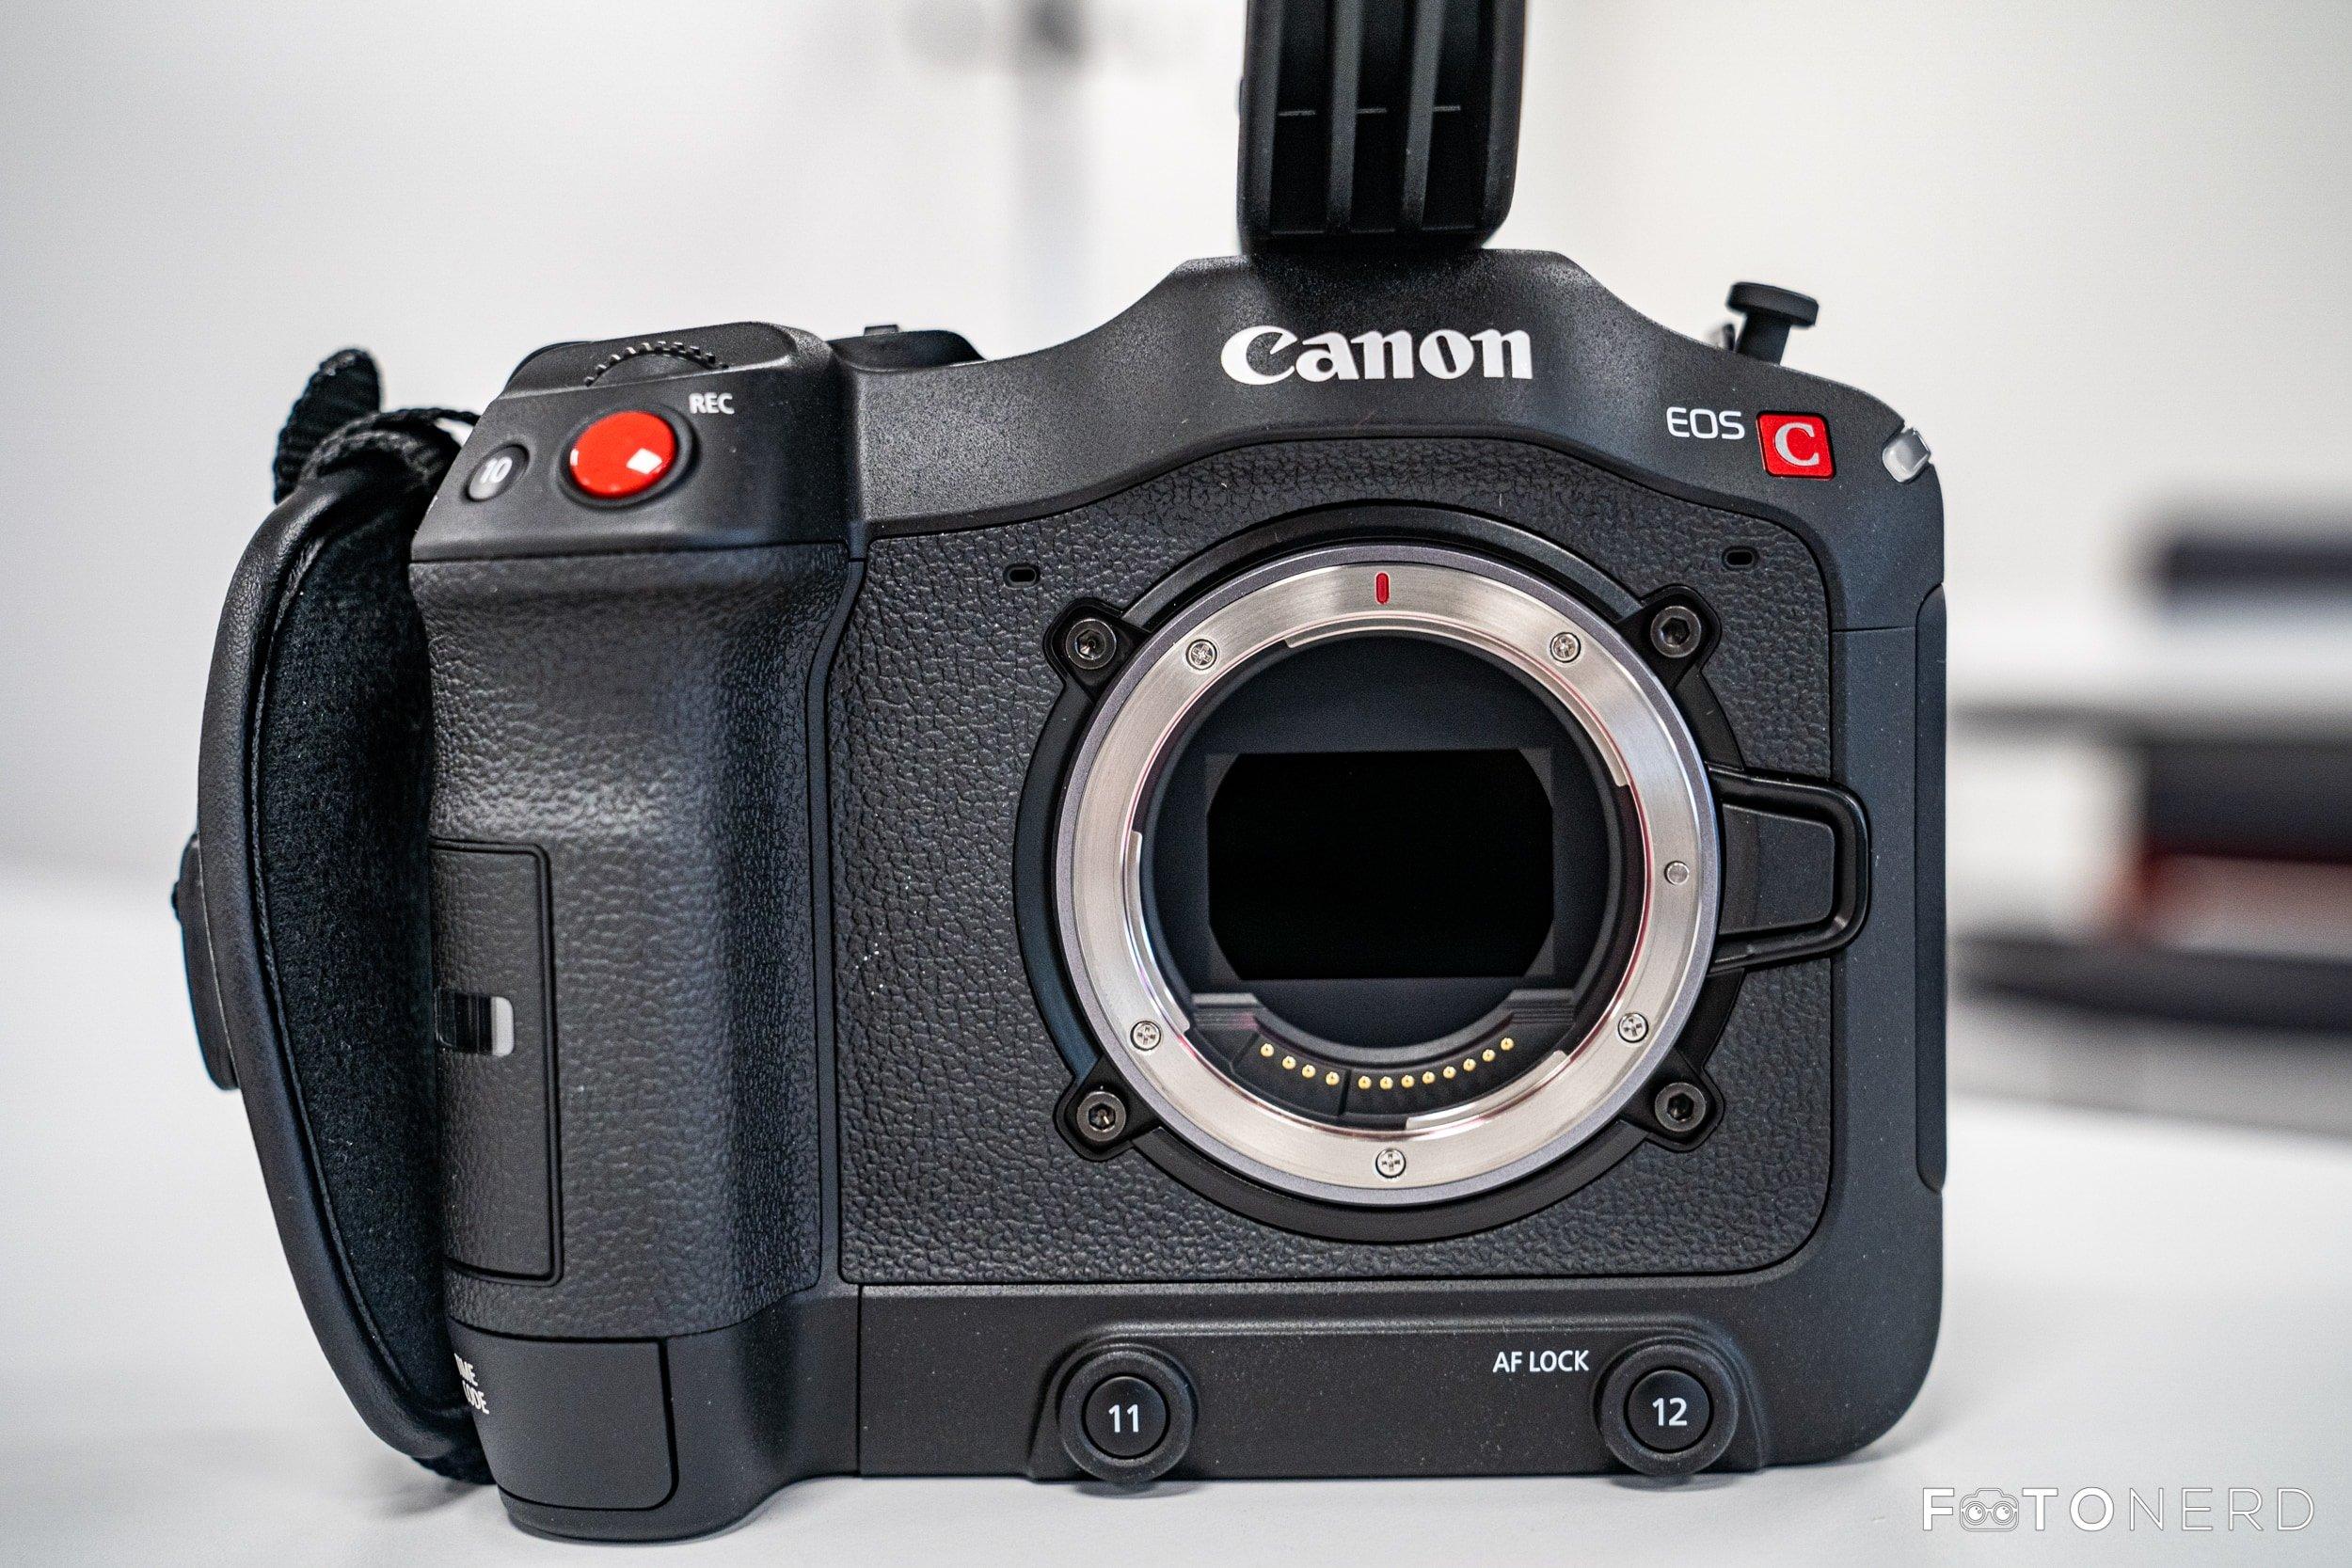 Canon EOS C70 firmware 1.0.1.1